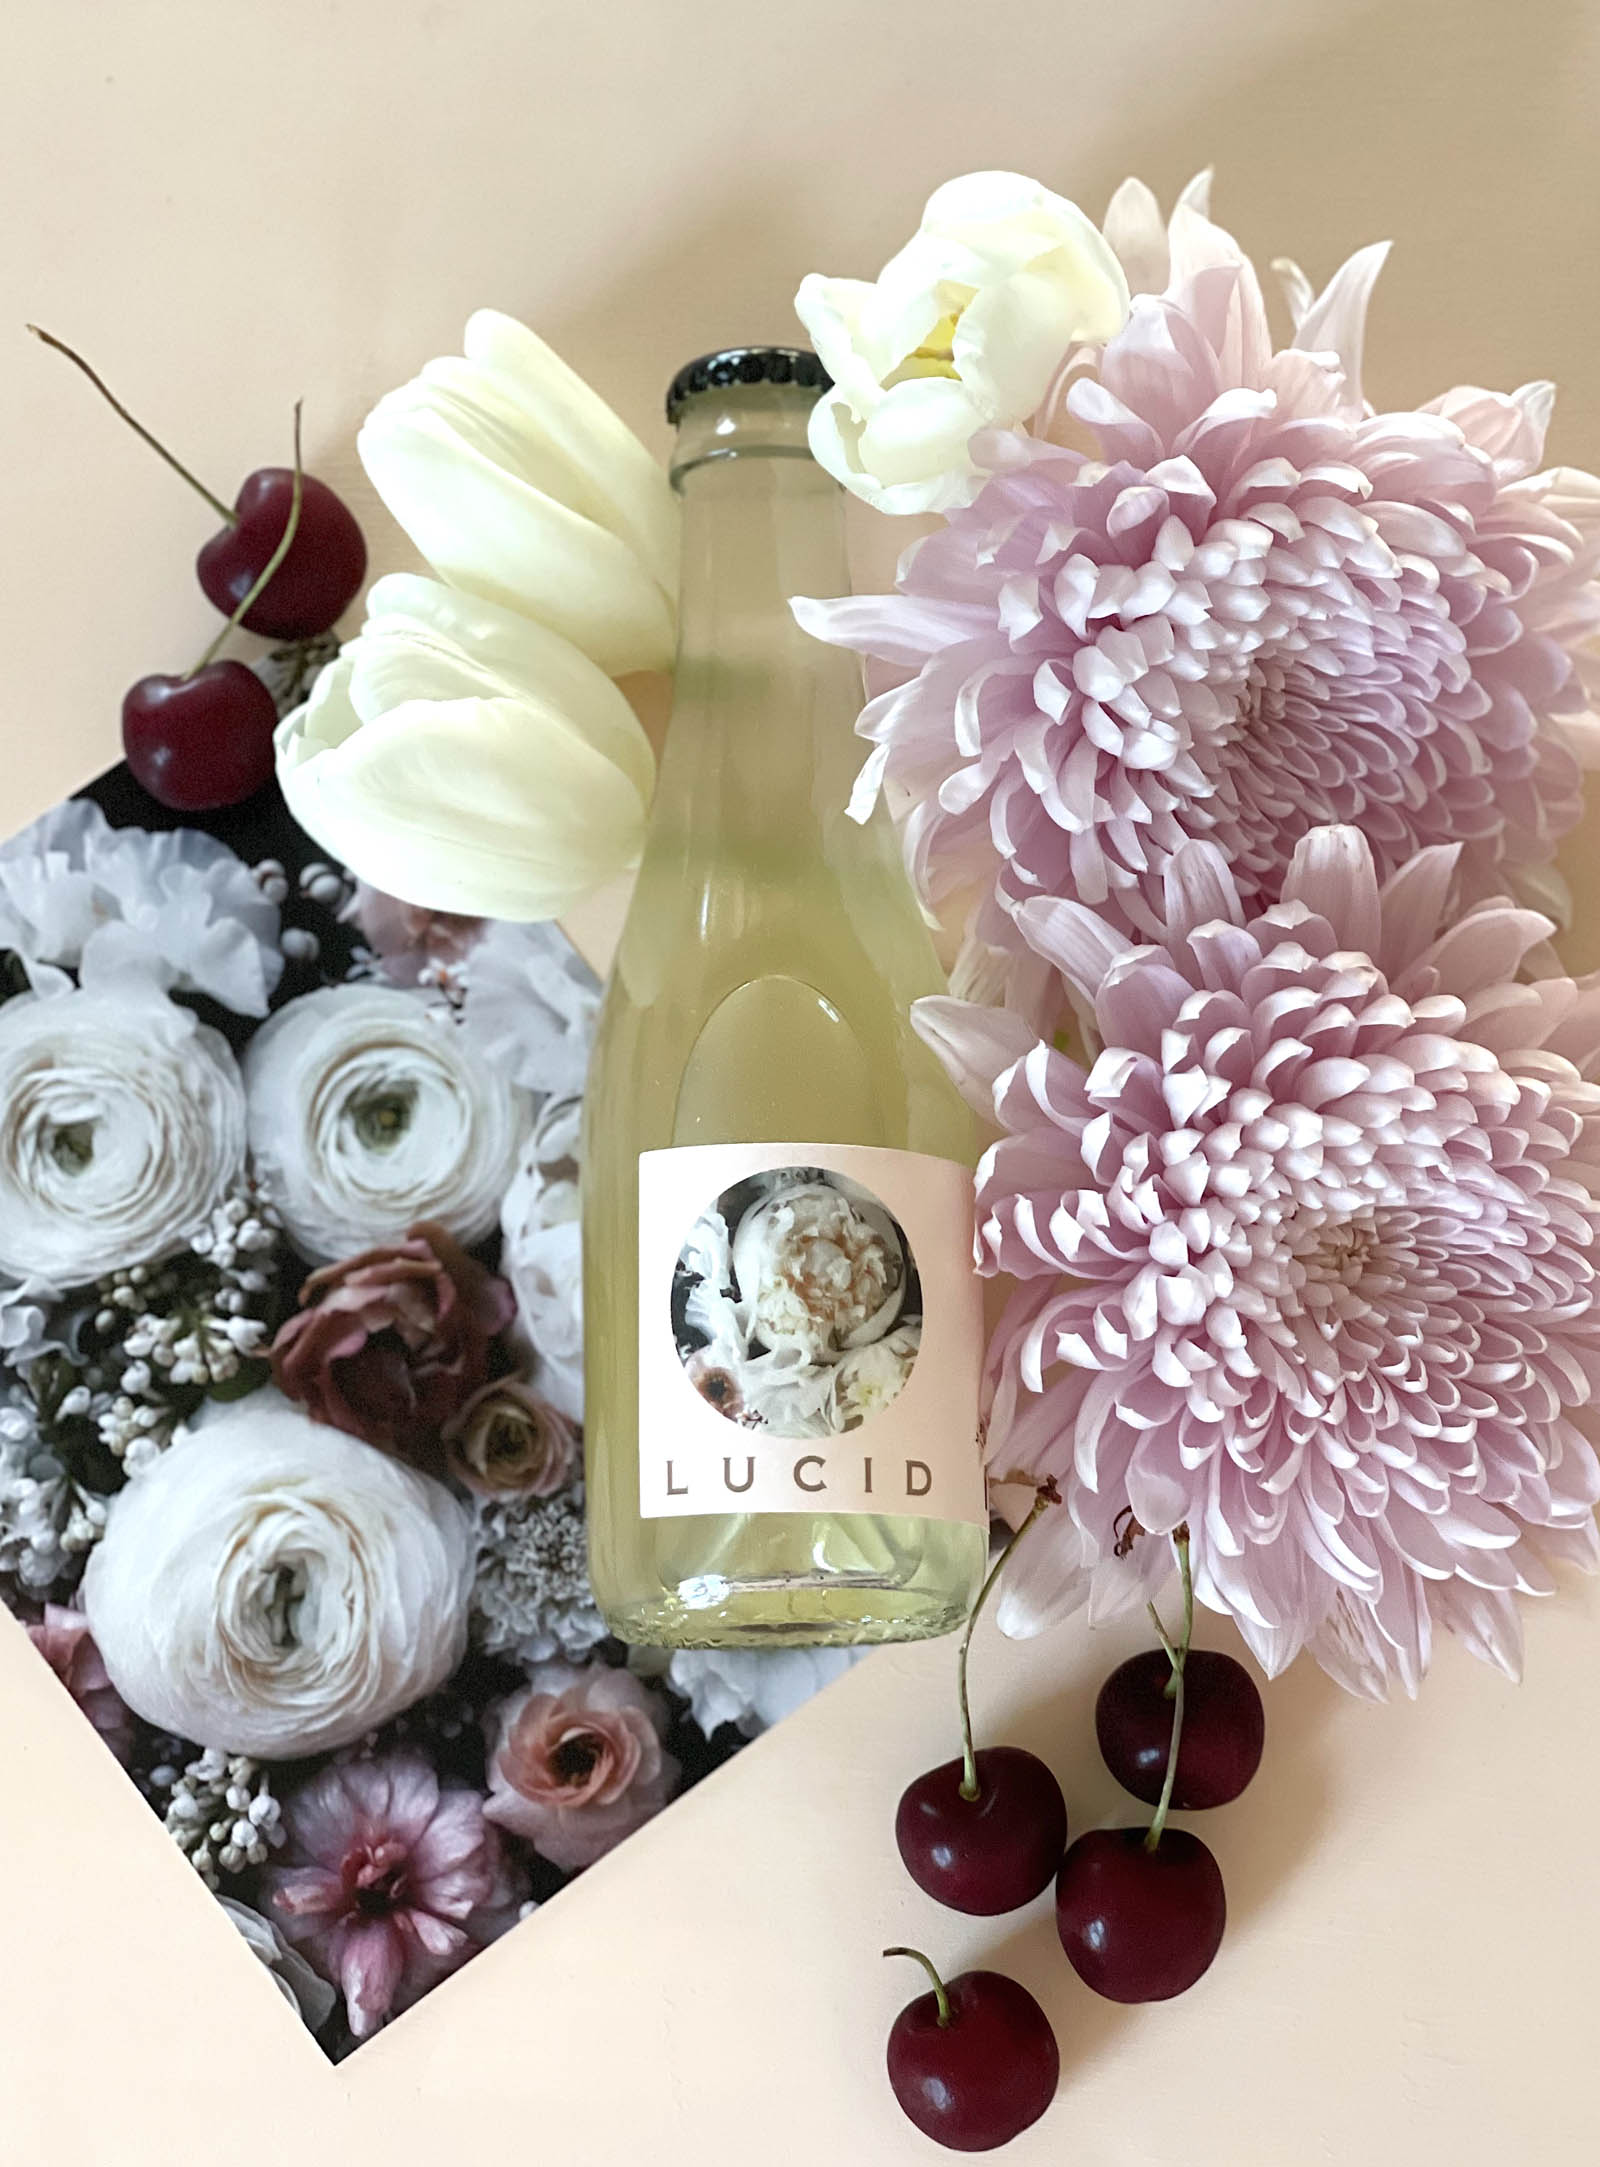 Organic Sparkling White Wine Tasting Kit